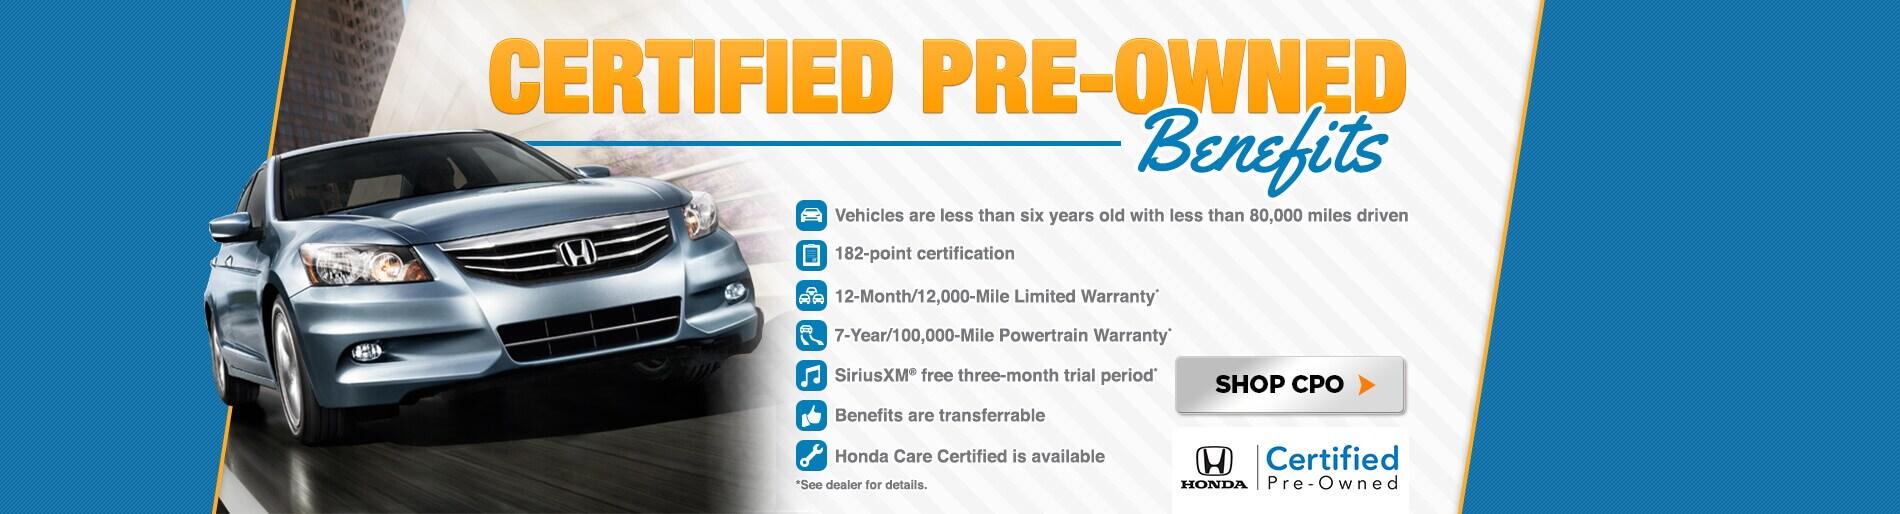 Certified Pre Owned Honda Benefits Pa Ray Price Honda